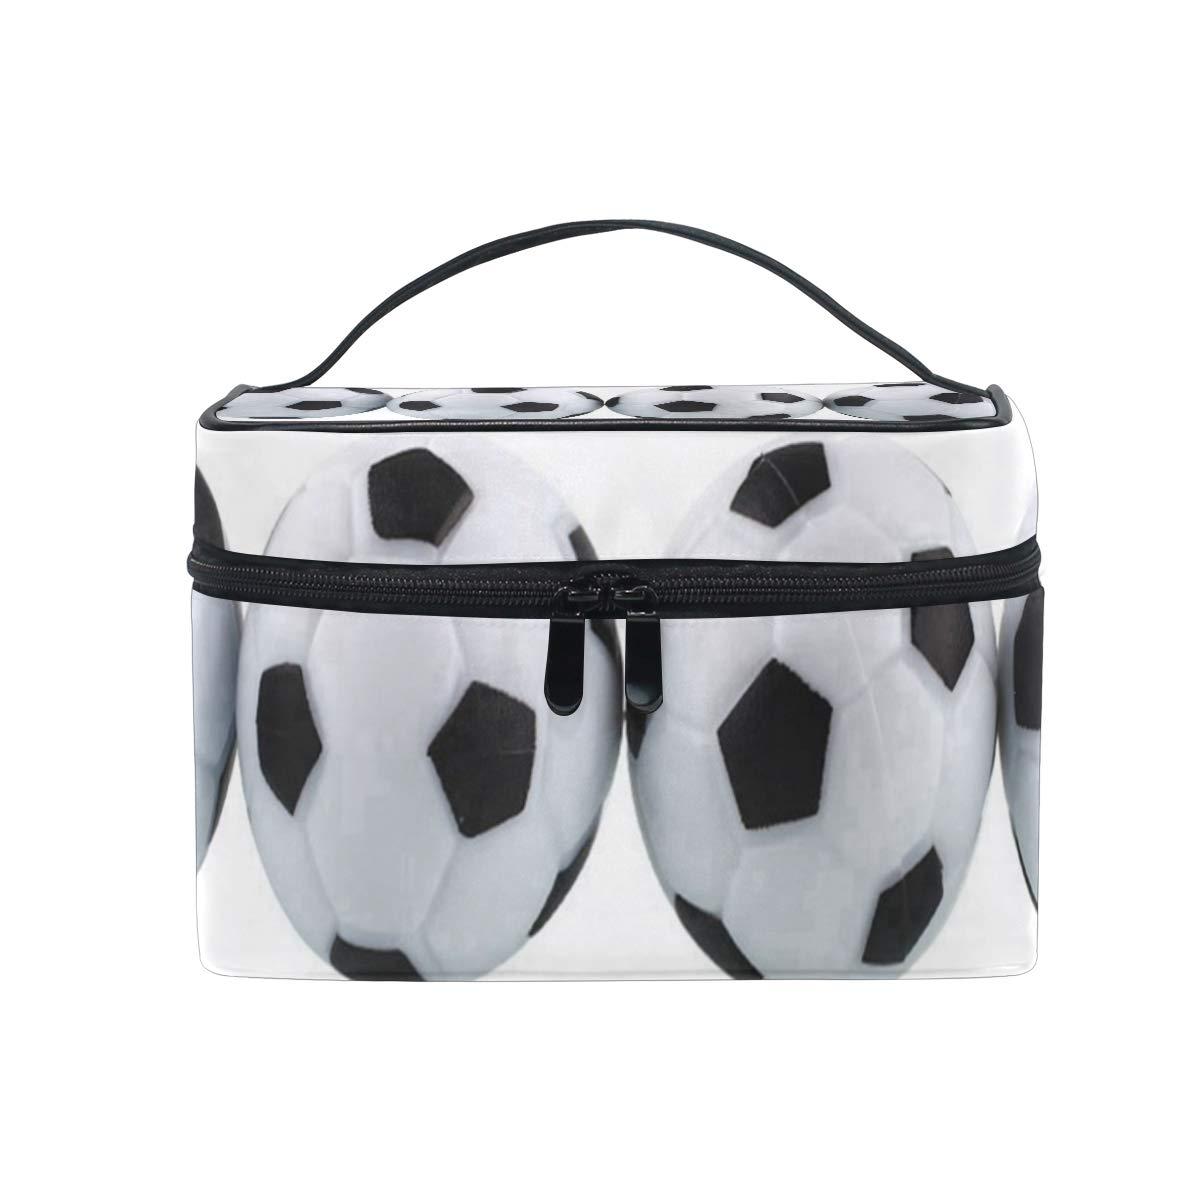 51808a82893d Amazon.com : Makeup Bag White Soccer Balls Cosmetic Bag Portable ...